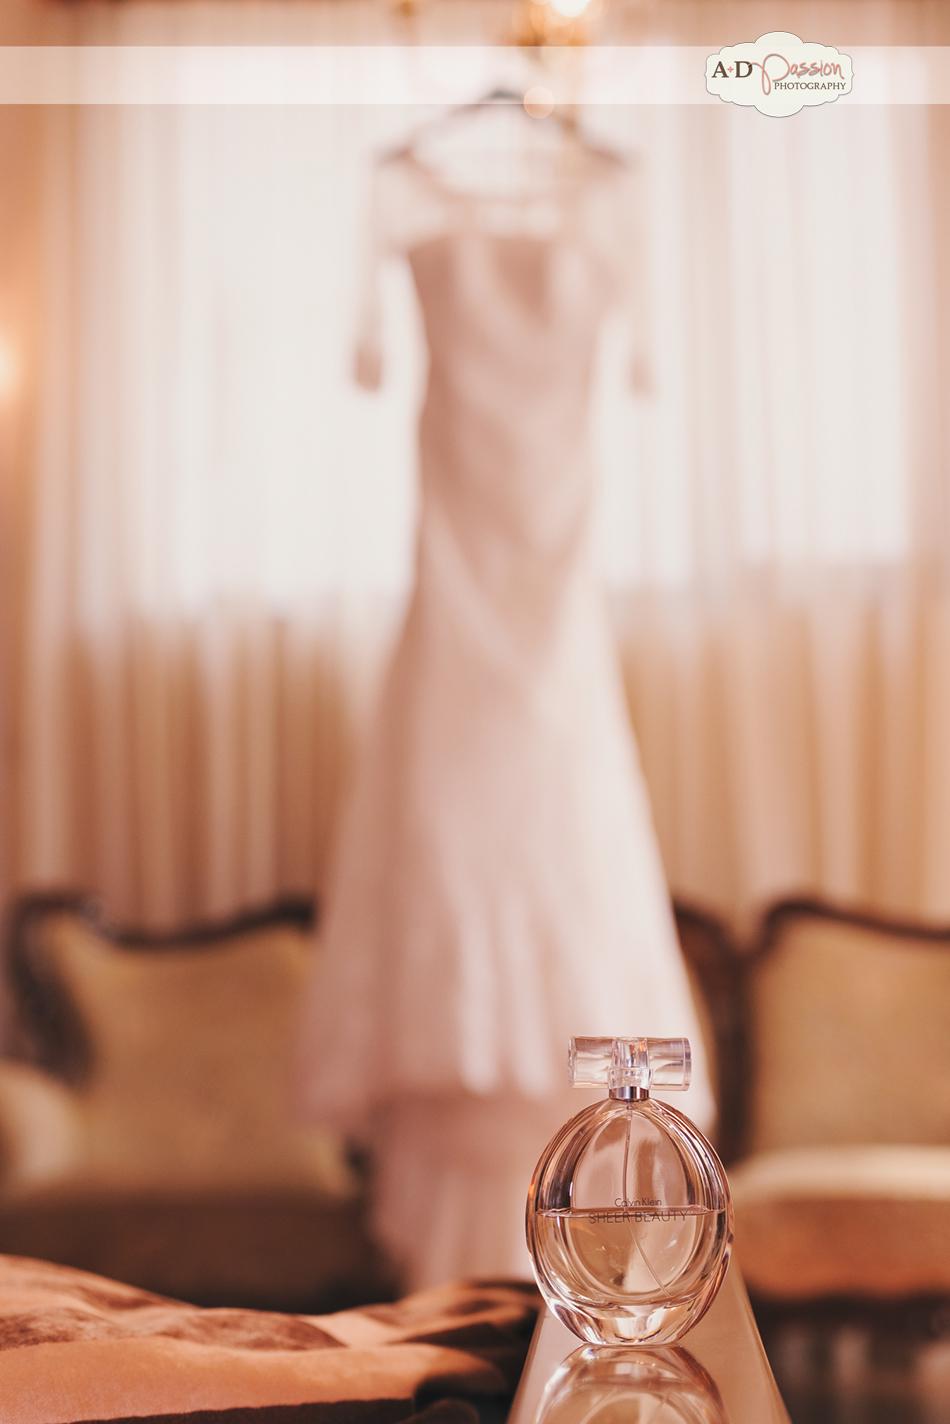 AD Passion Photography | 20130825_fotograf-nunta-vintage_octavian-simina_0023 | Adelin, Dida, fotograf profesionist, fotograf de nunta, fotografie de nunta, fotograf Timisoara, fotograf Craiova, fotograf Bucuresti, fotograf Arad, nunta Timisoara, nunta Arad, nunta Bucuresti, nunta Craiova